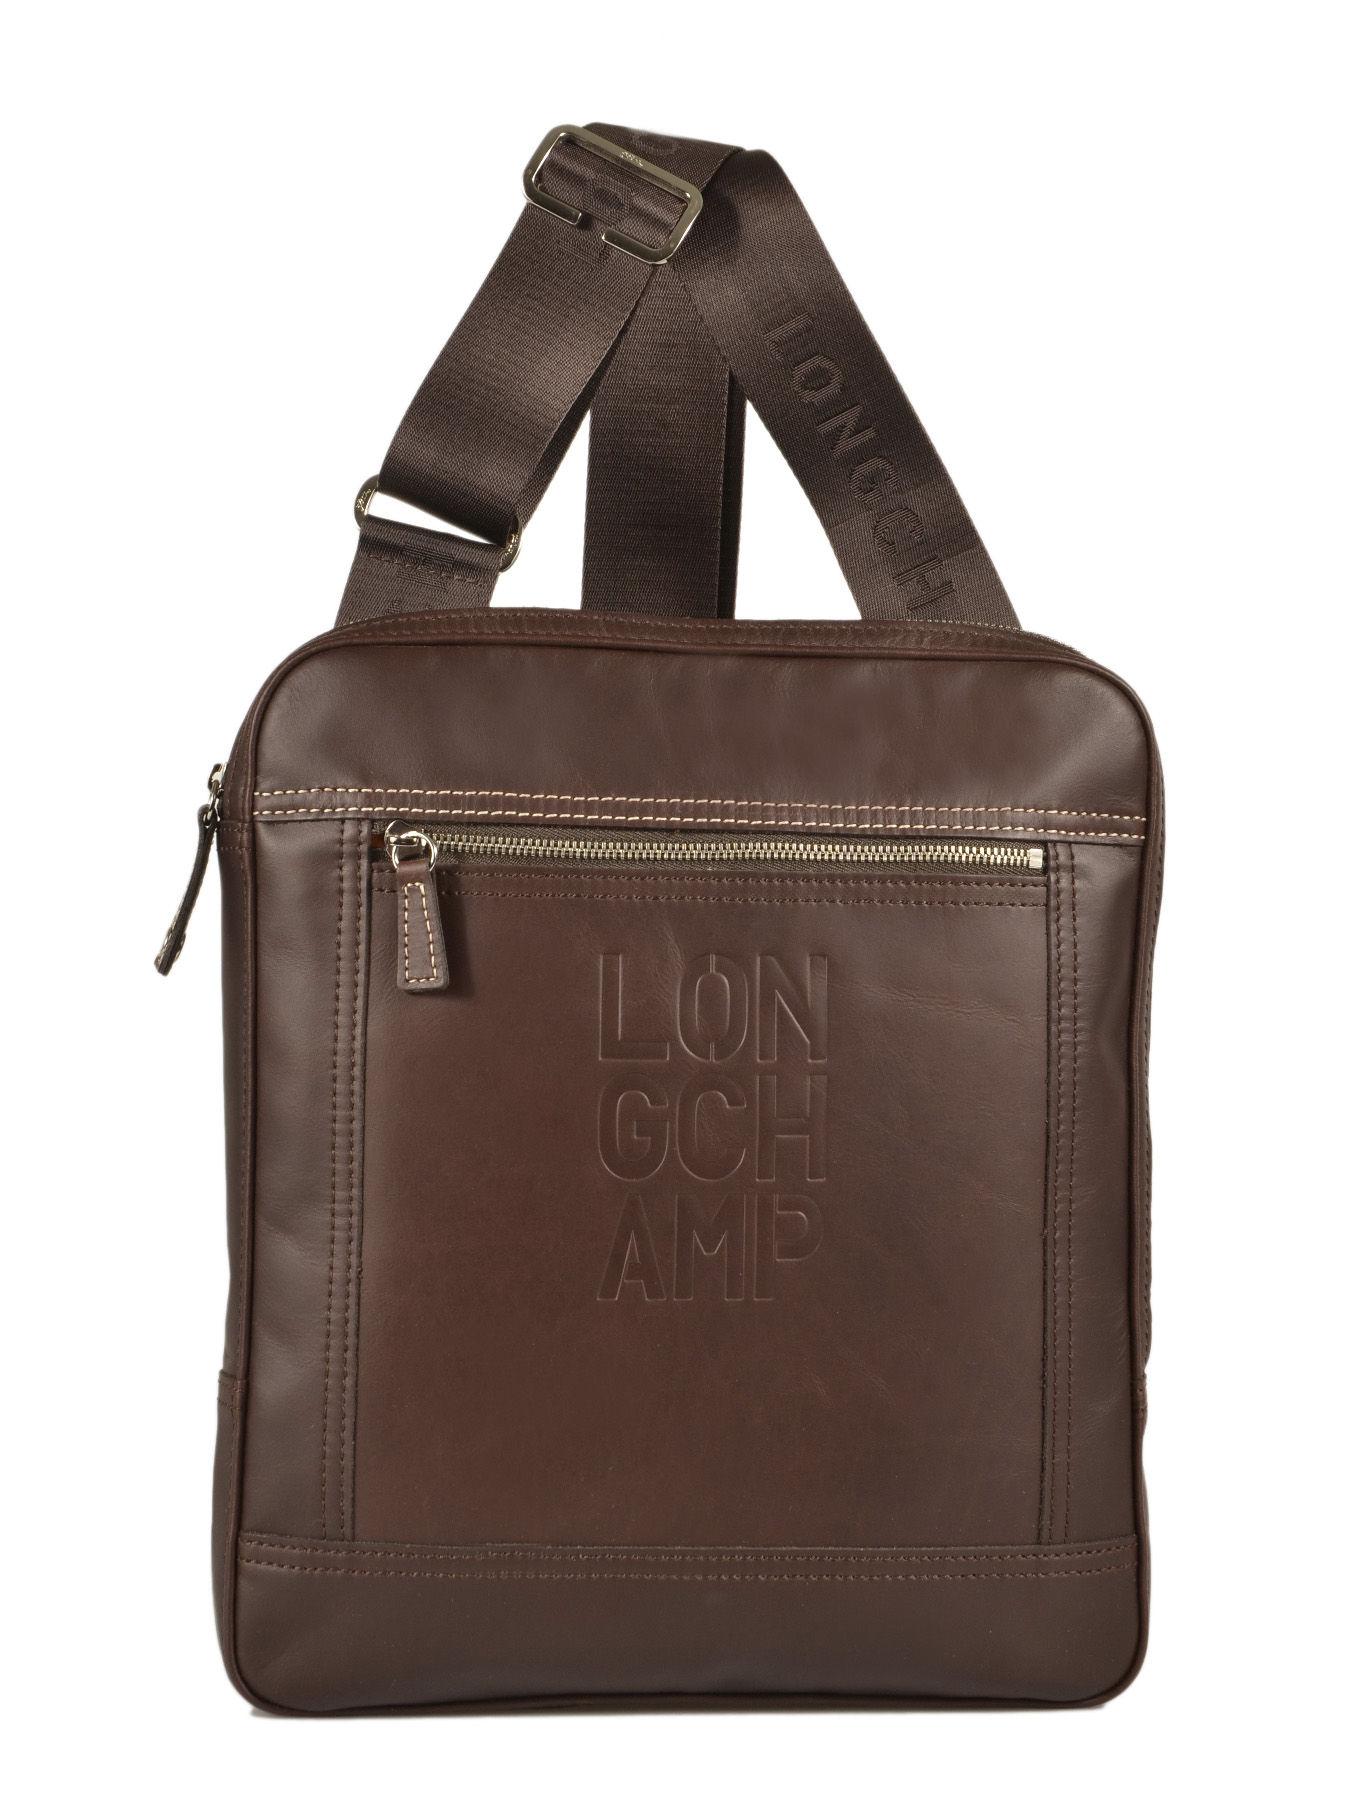 16d3043714 Sacoche homme Longchamp : quelle sacoche choisir ?